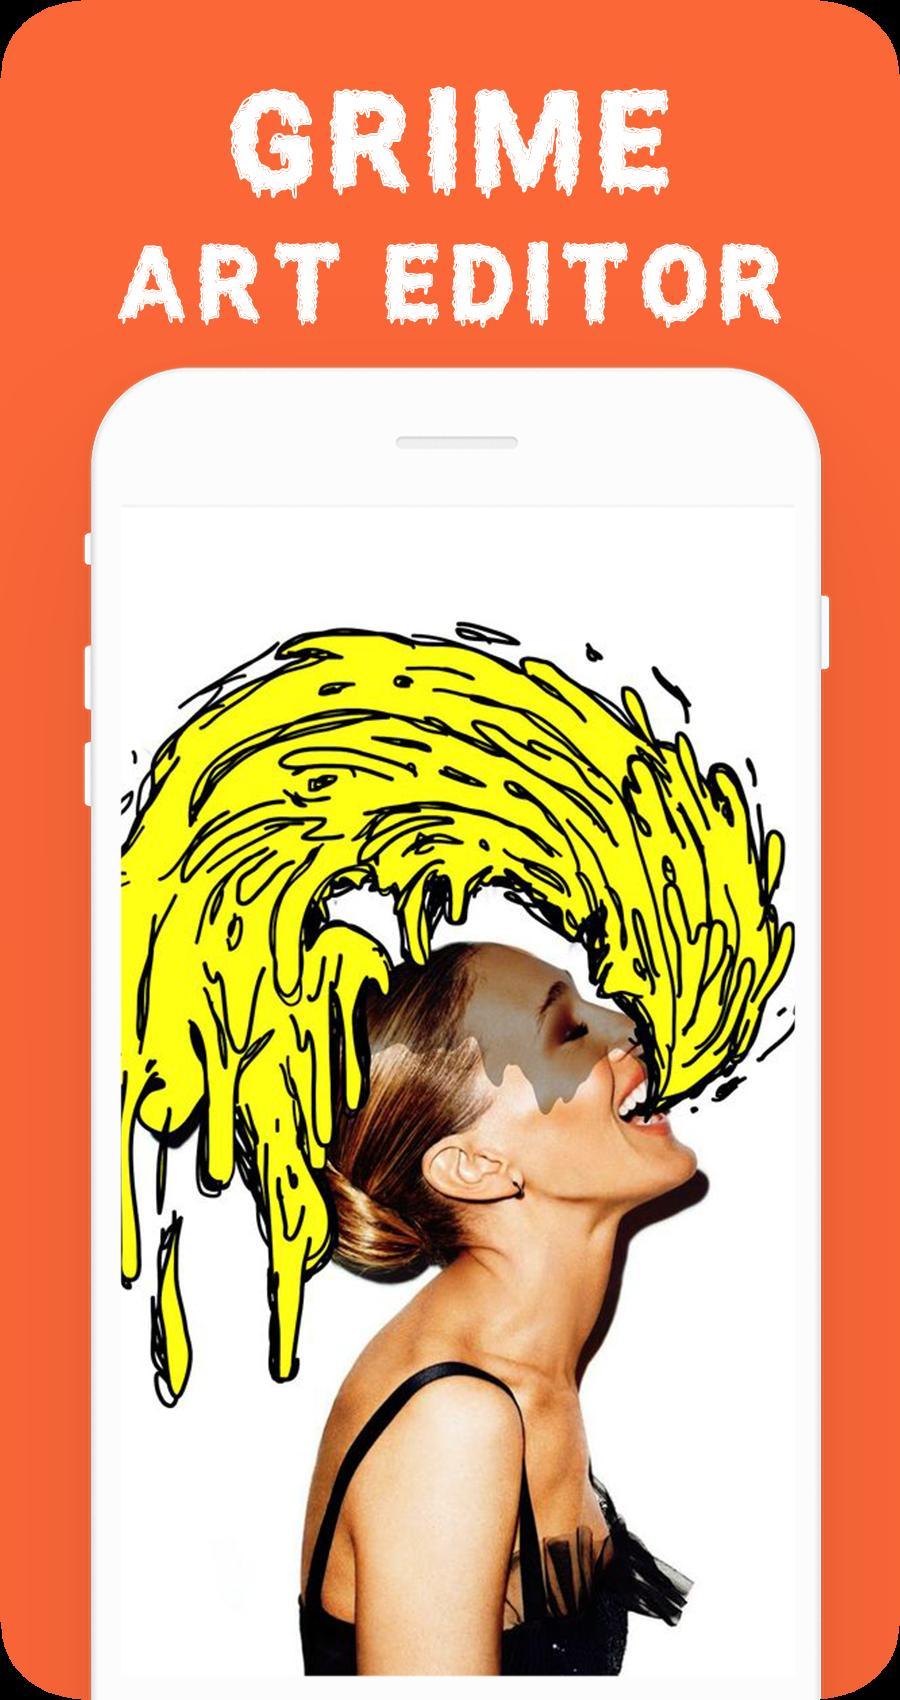 Aplikasi android gratis Grime Art Editor